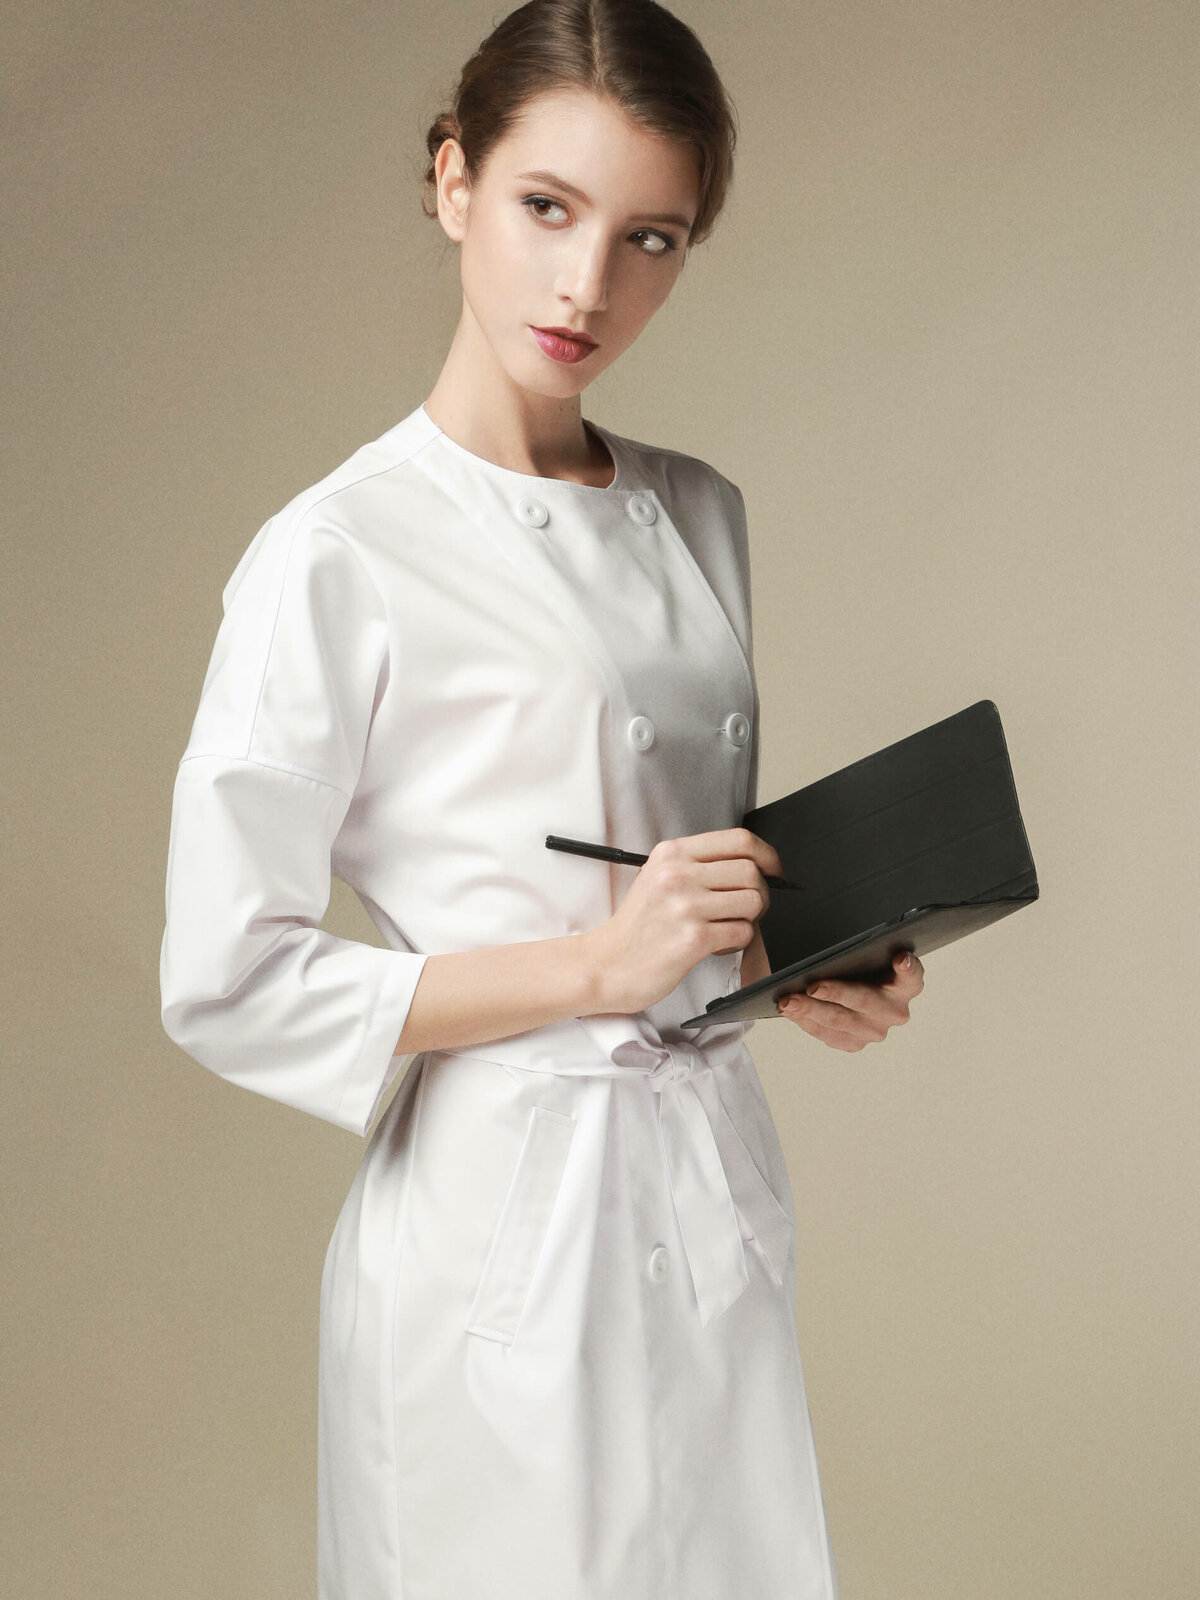 картинки девушки в белом халате